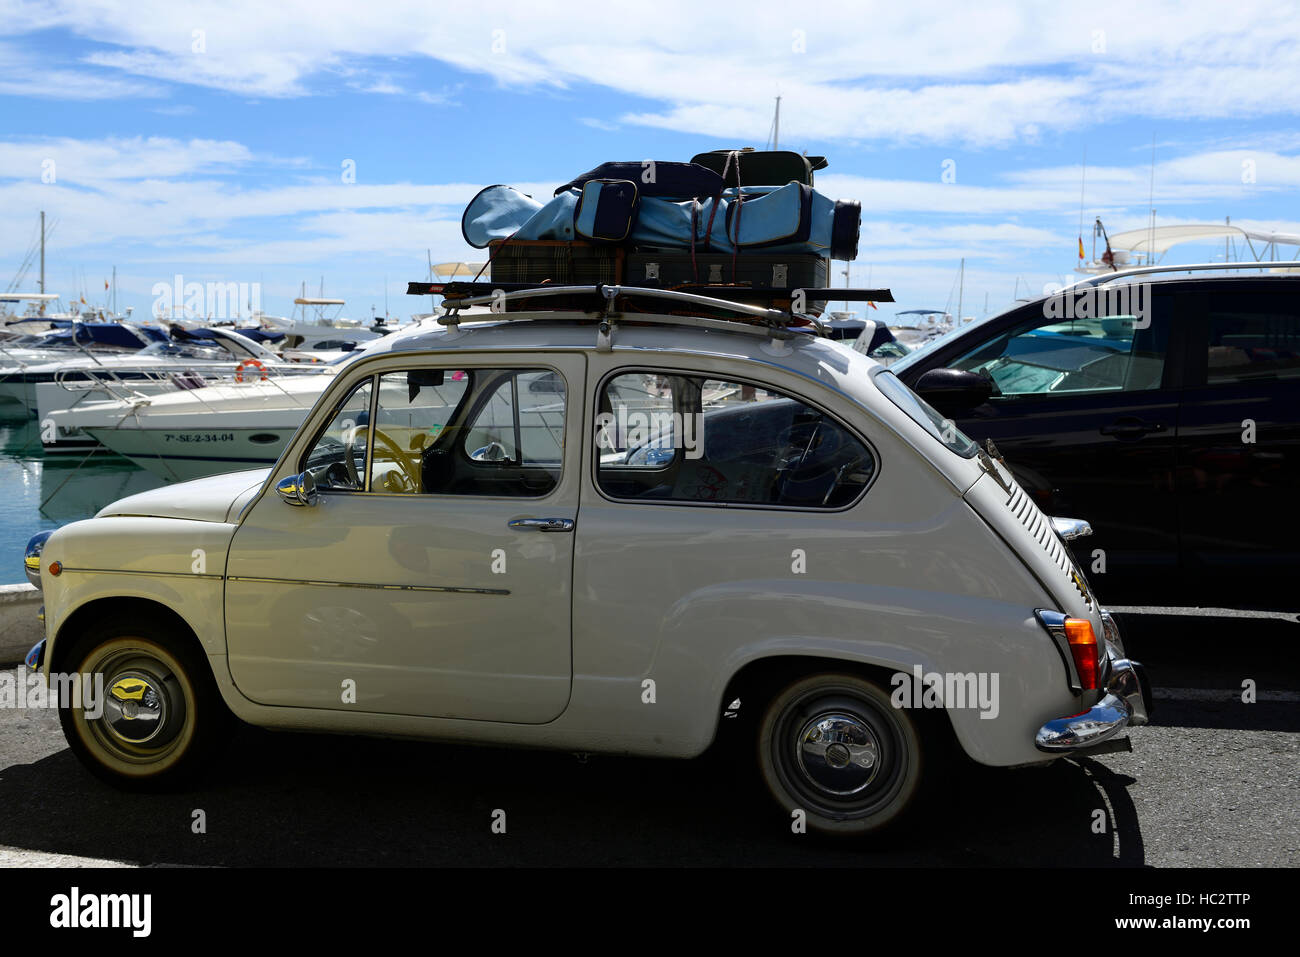 Luggage Rack Stock Photos & Luggage Rack Stock Images - Alamy